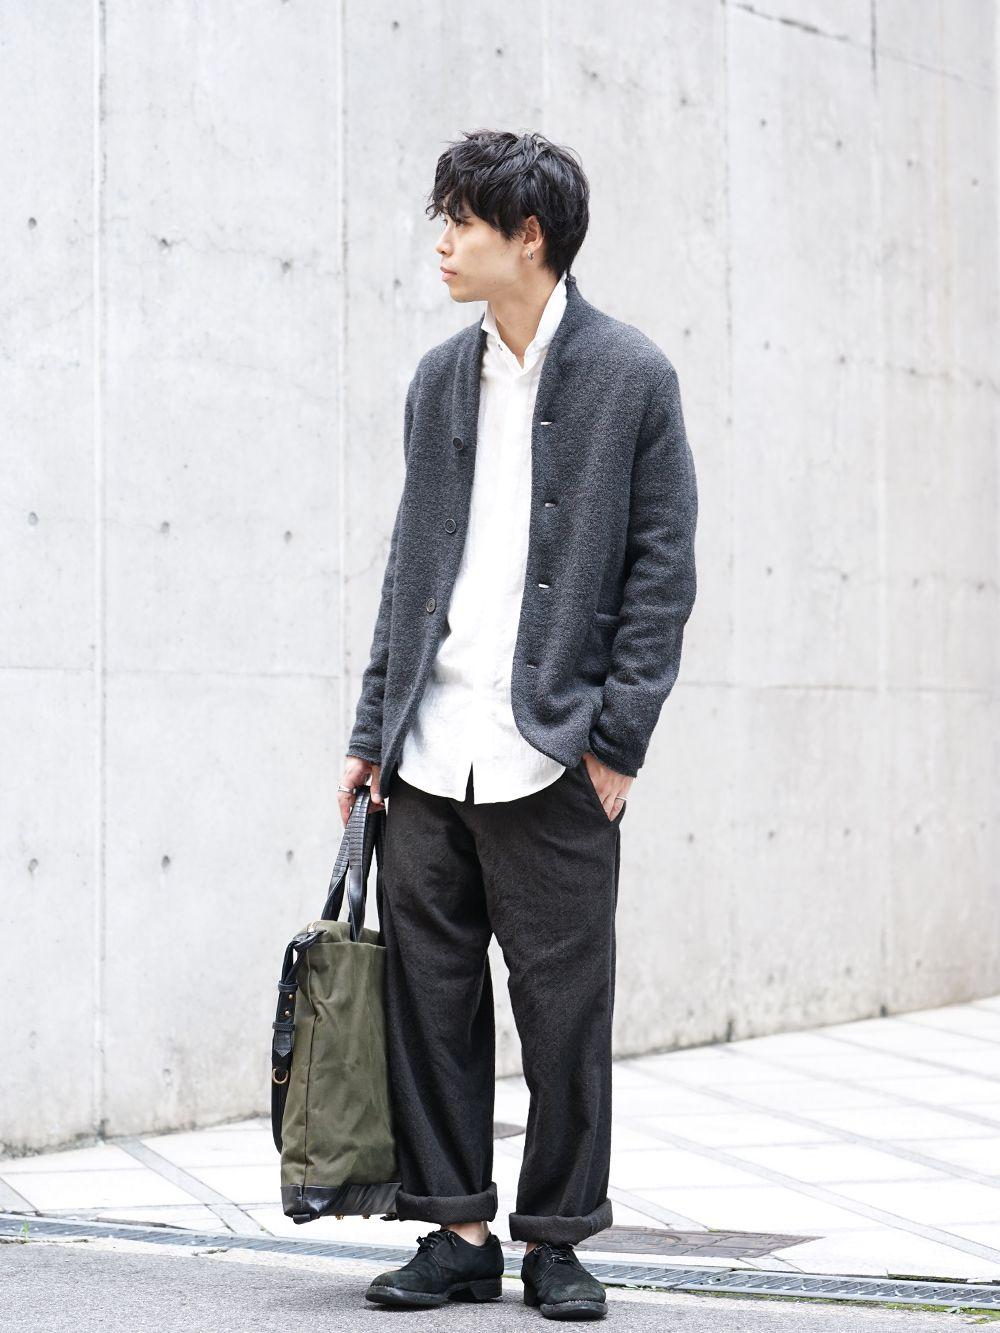 hannibal 19-20AW Autumn Knit Jacket Style - 1-001